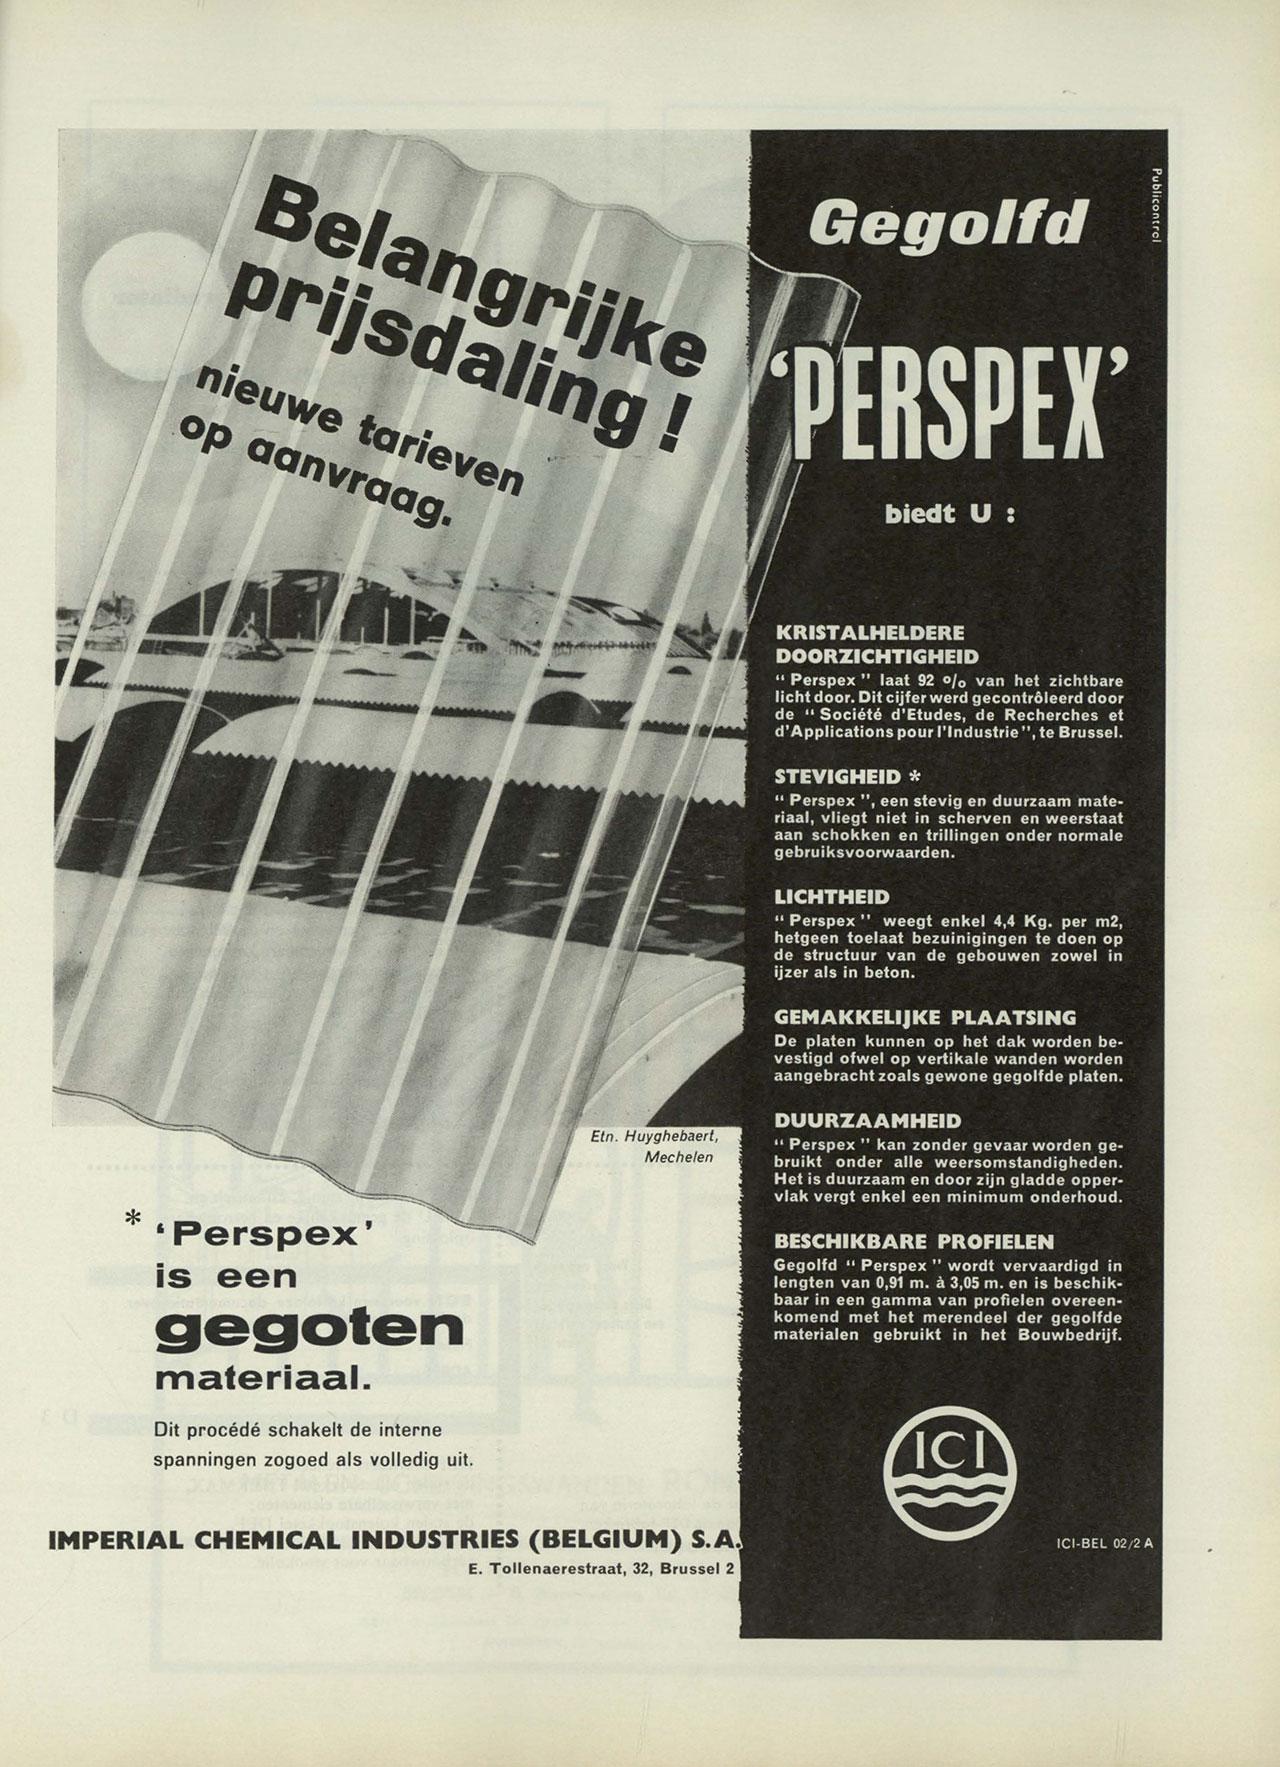 Perspex